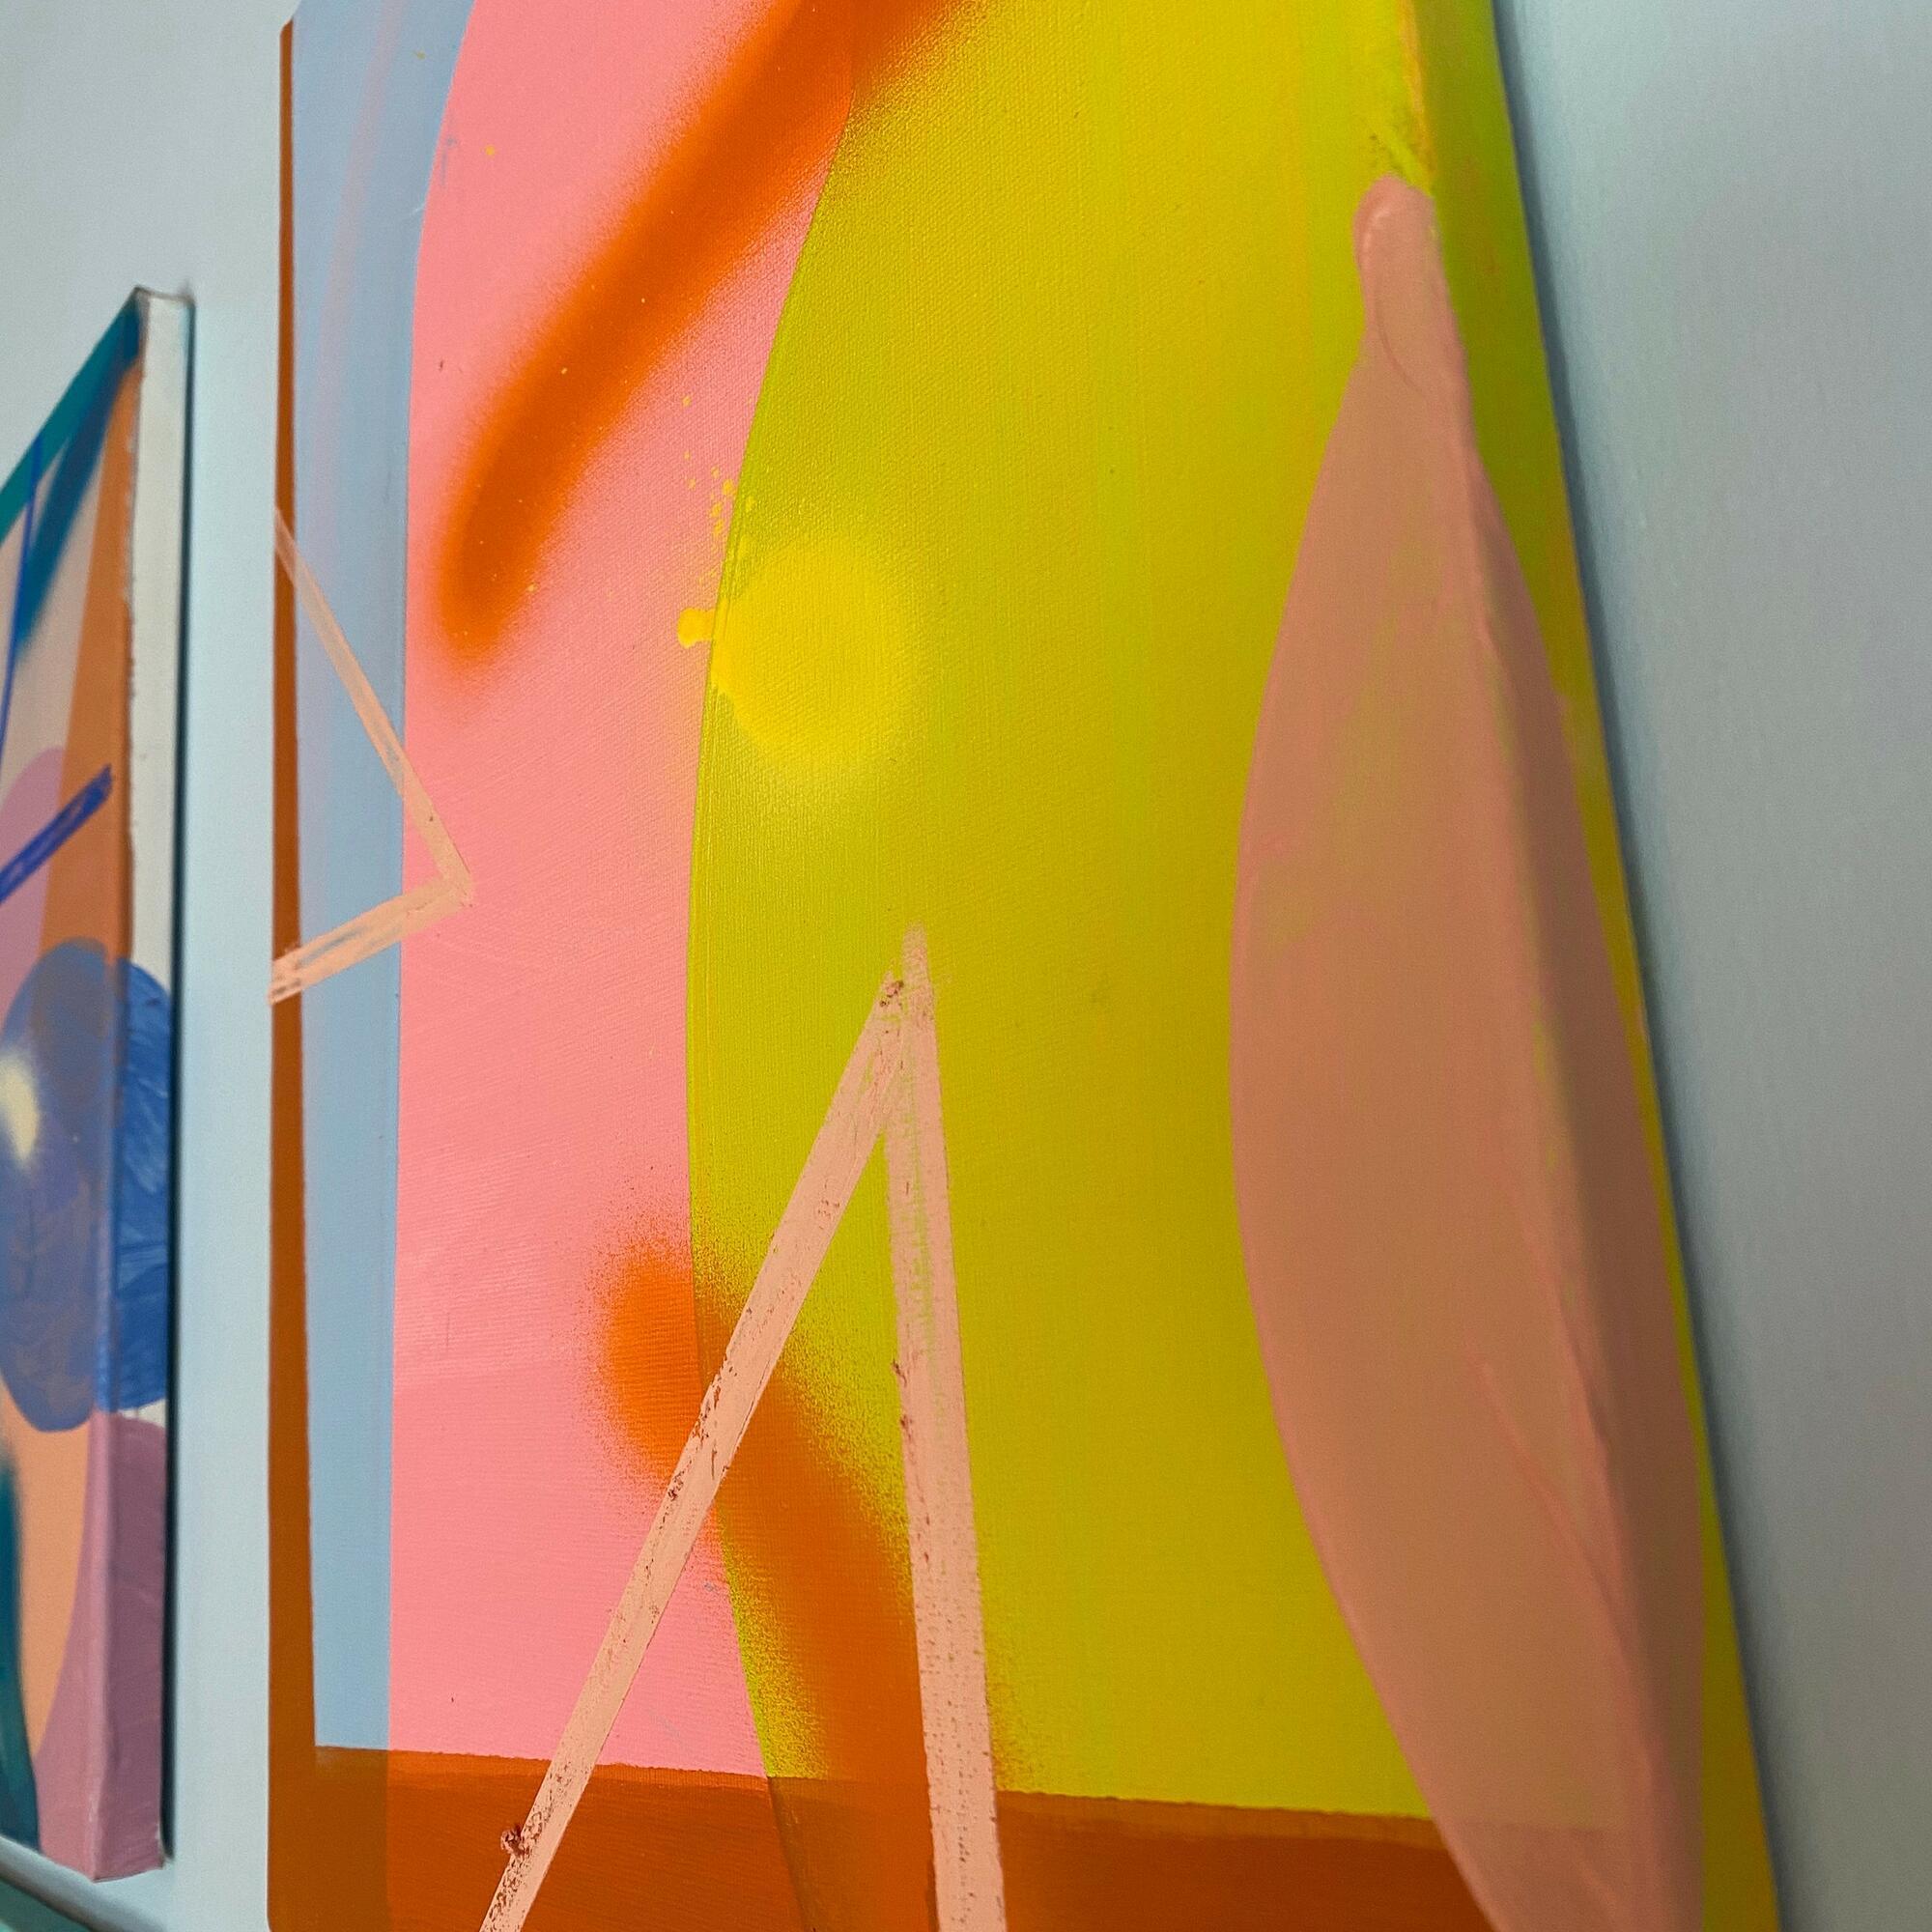 Zestaw Abstract #3 - Klo | JestemSlow.pl